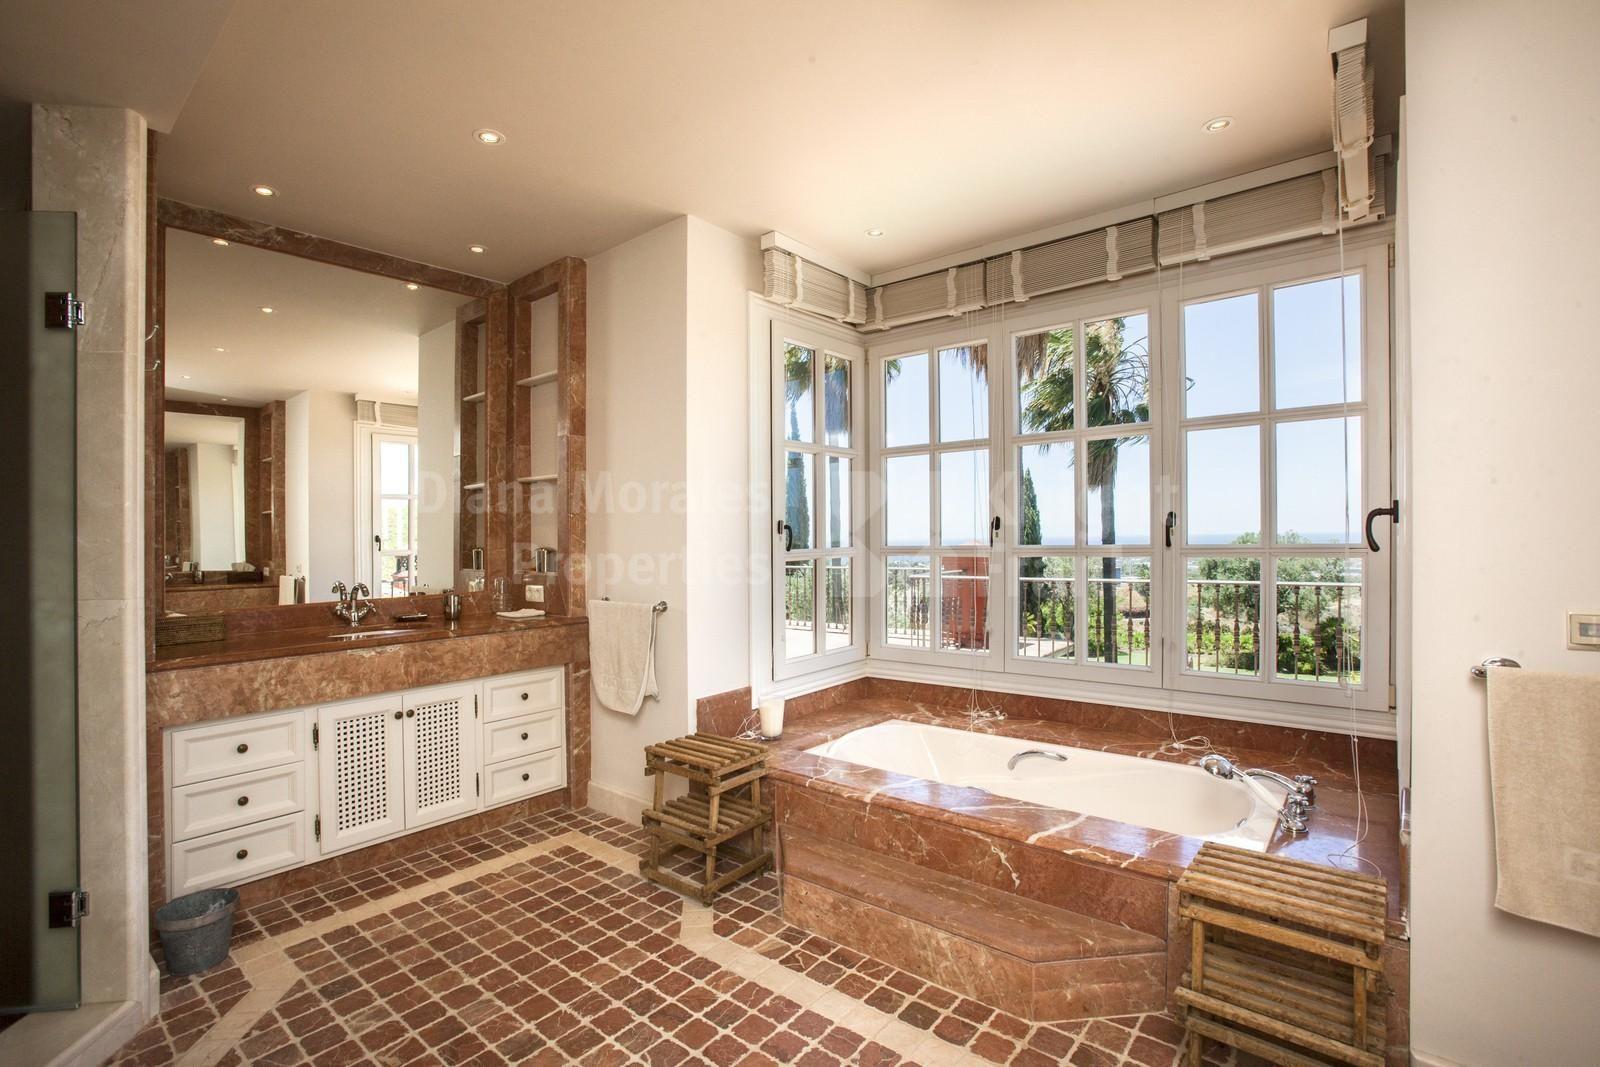 Magnificent Villa - Villa, Marbella Hill Club, Marbella Golden Mile